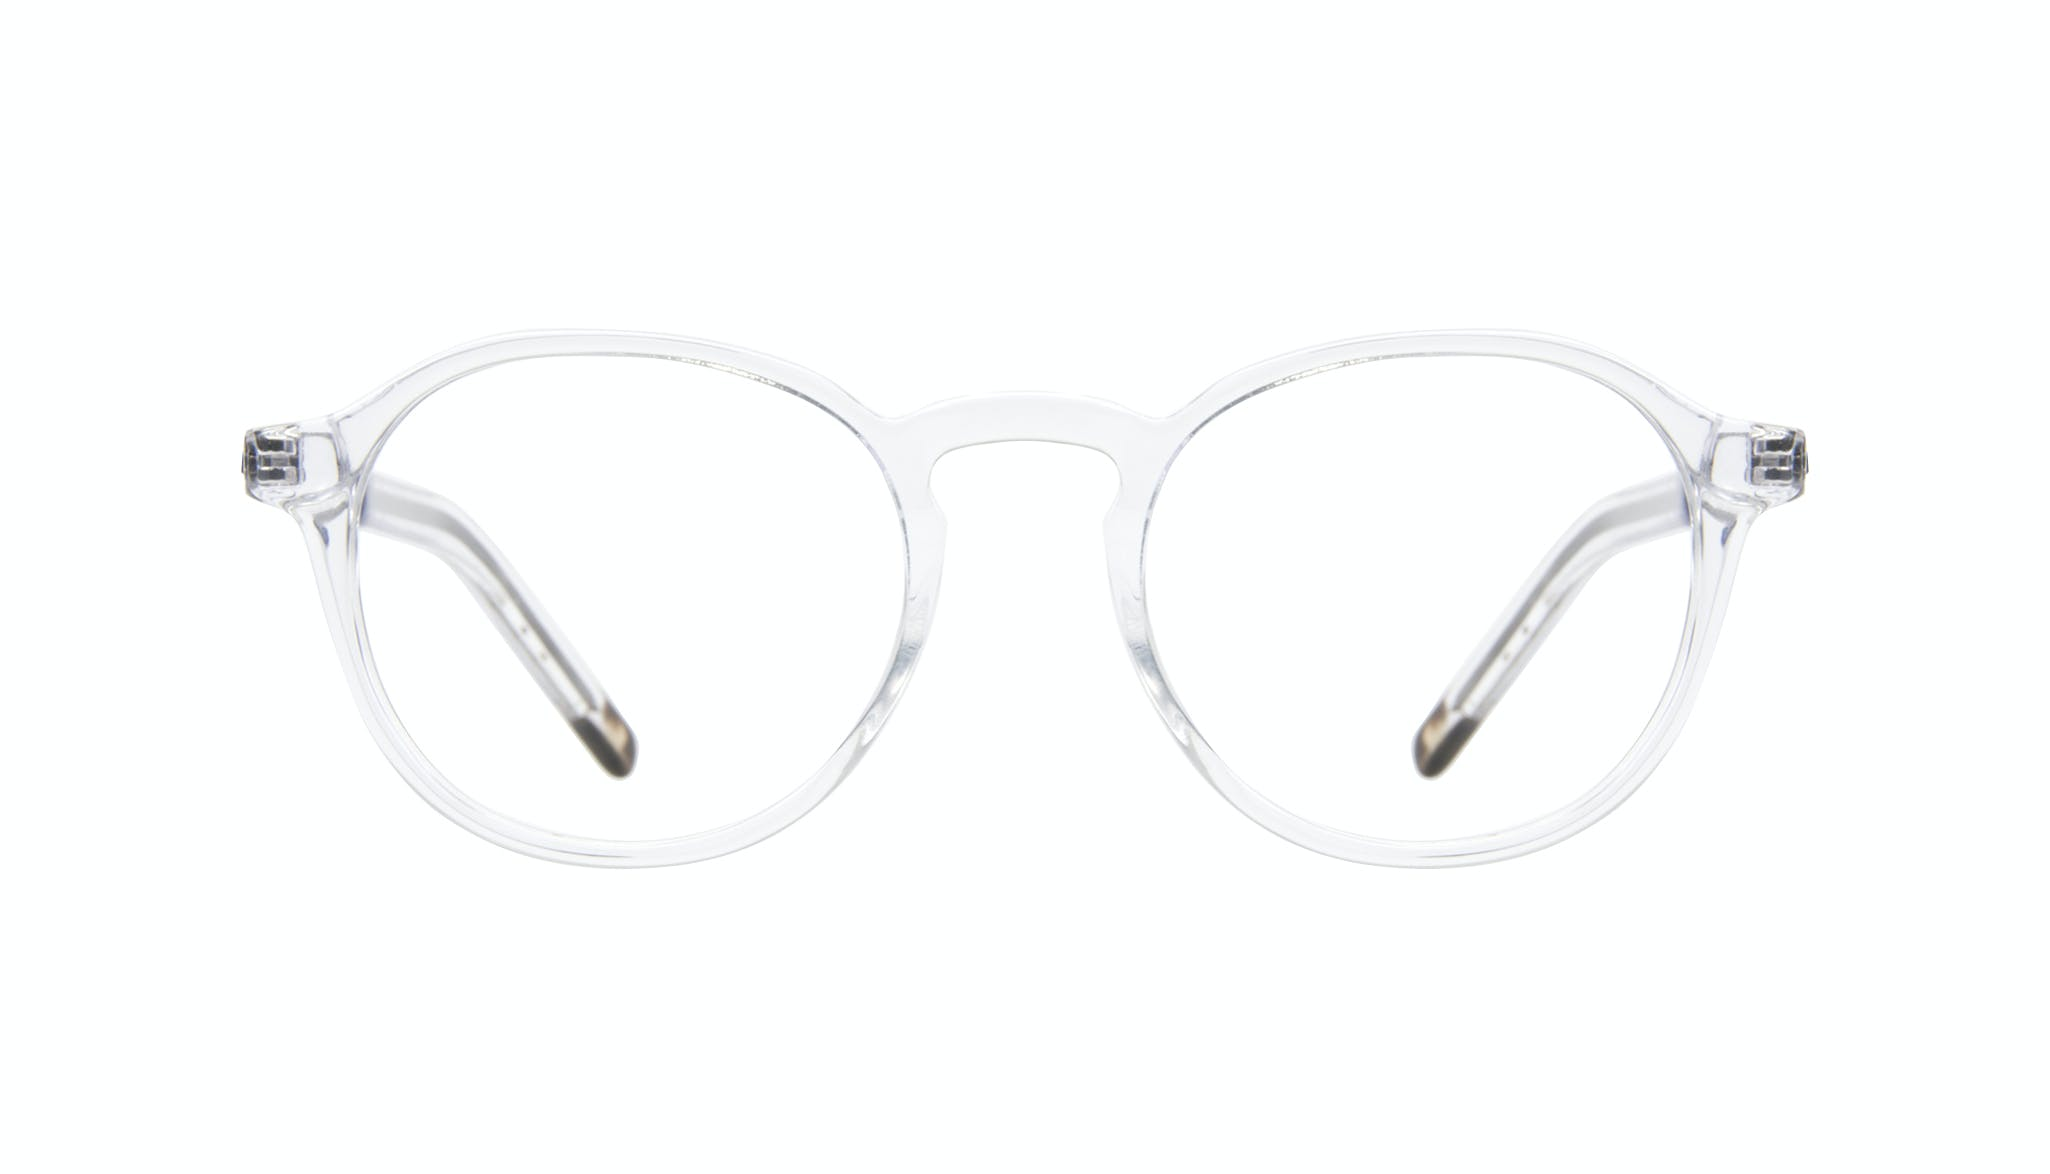 Affordable Fashion Glasses Round Eyeglasses Men Prime Clear Front